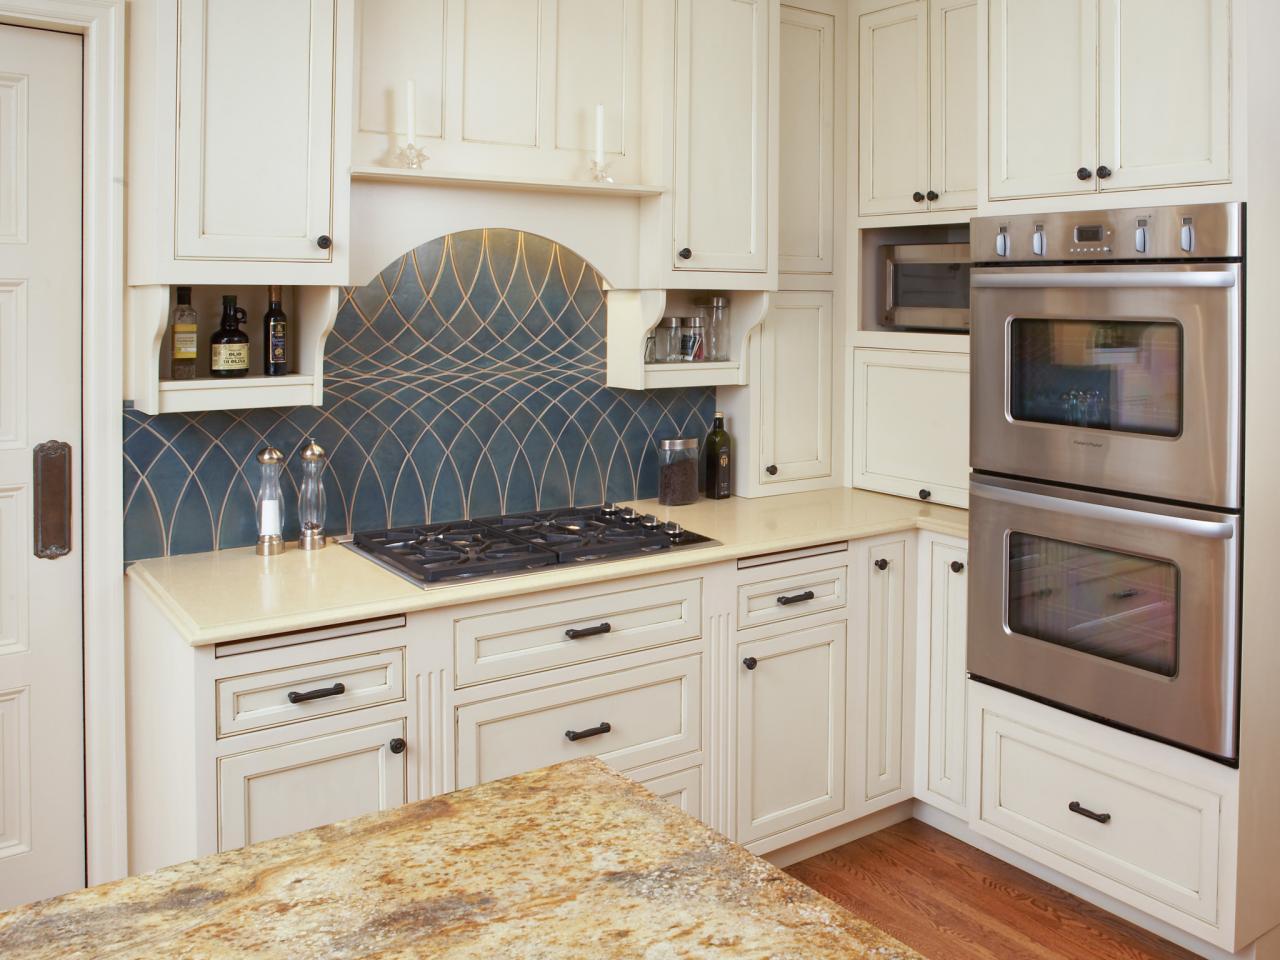 Stunning Country Kitchen Backsplash Ideas country kitchen backsplash designs